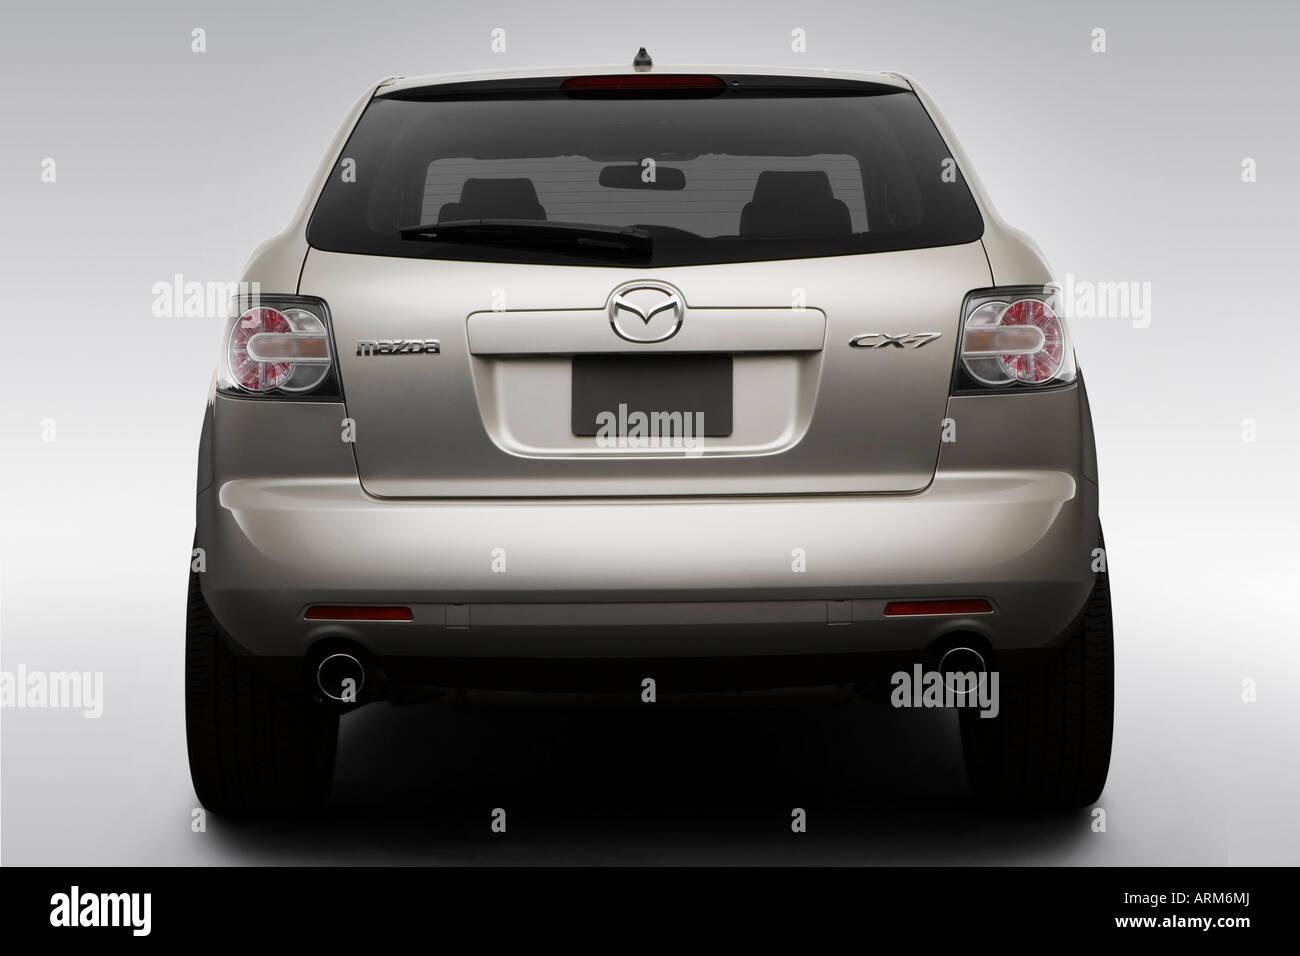 Kelebihan Kekurangan Mazda Cx 7 2008 Review